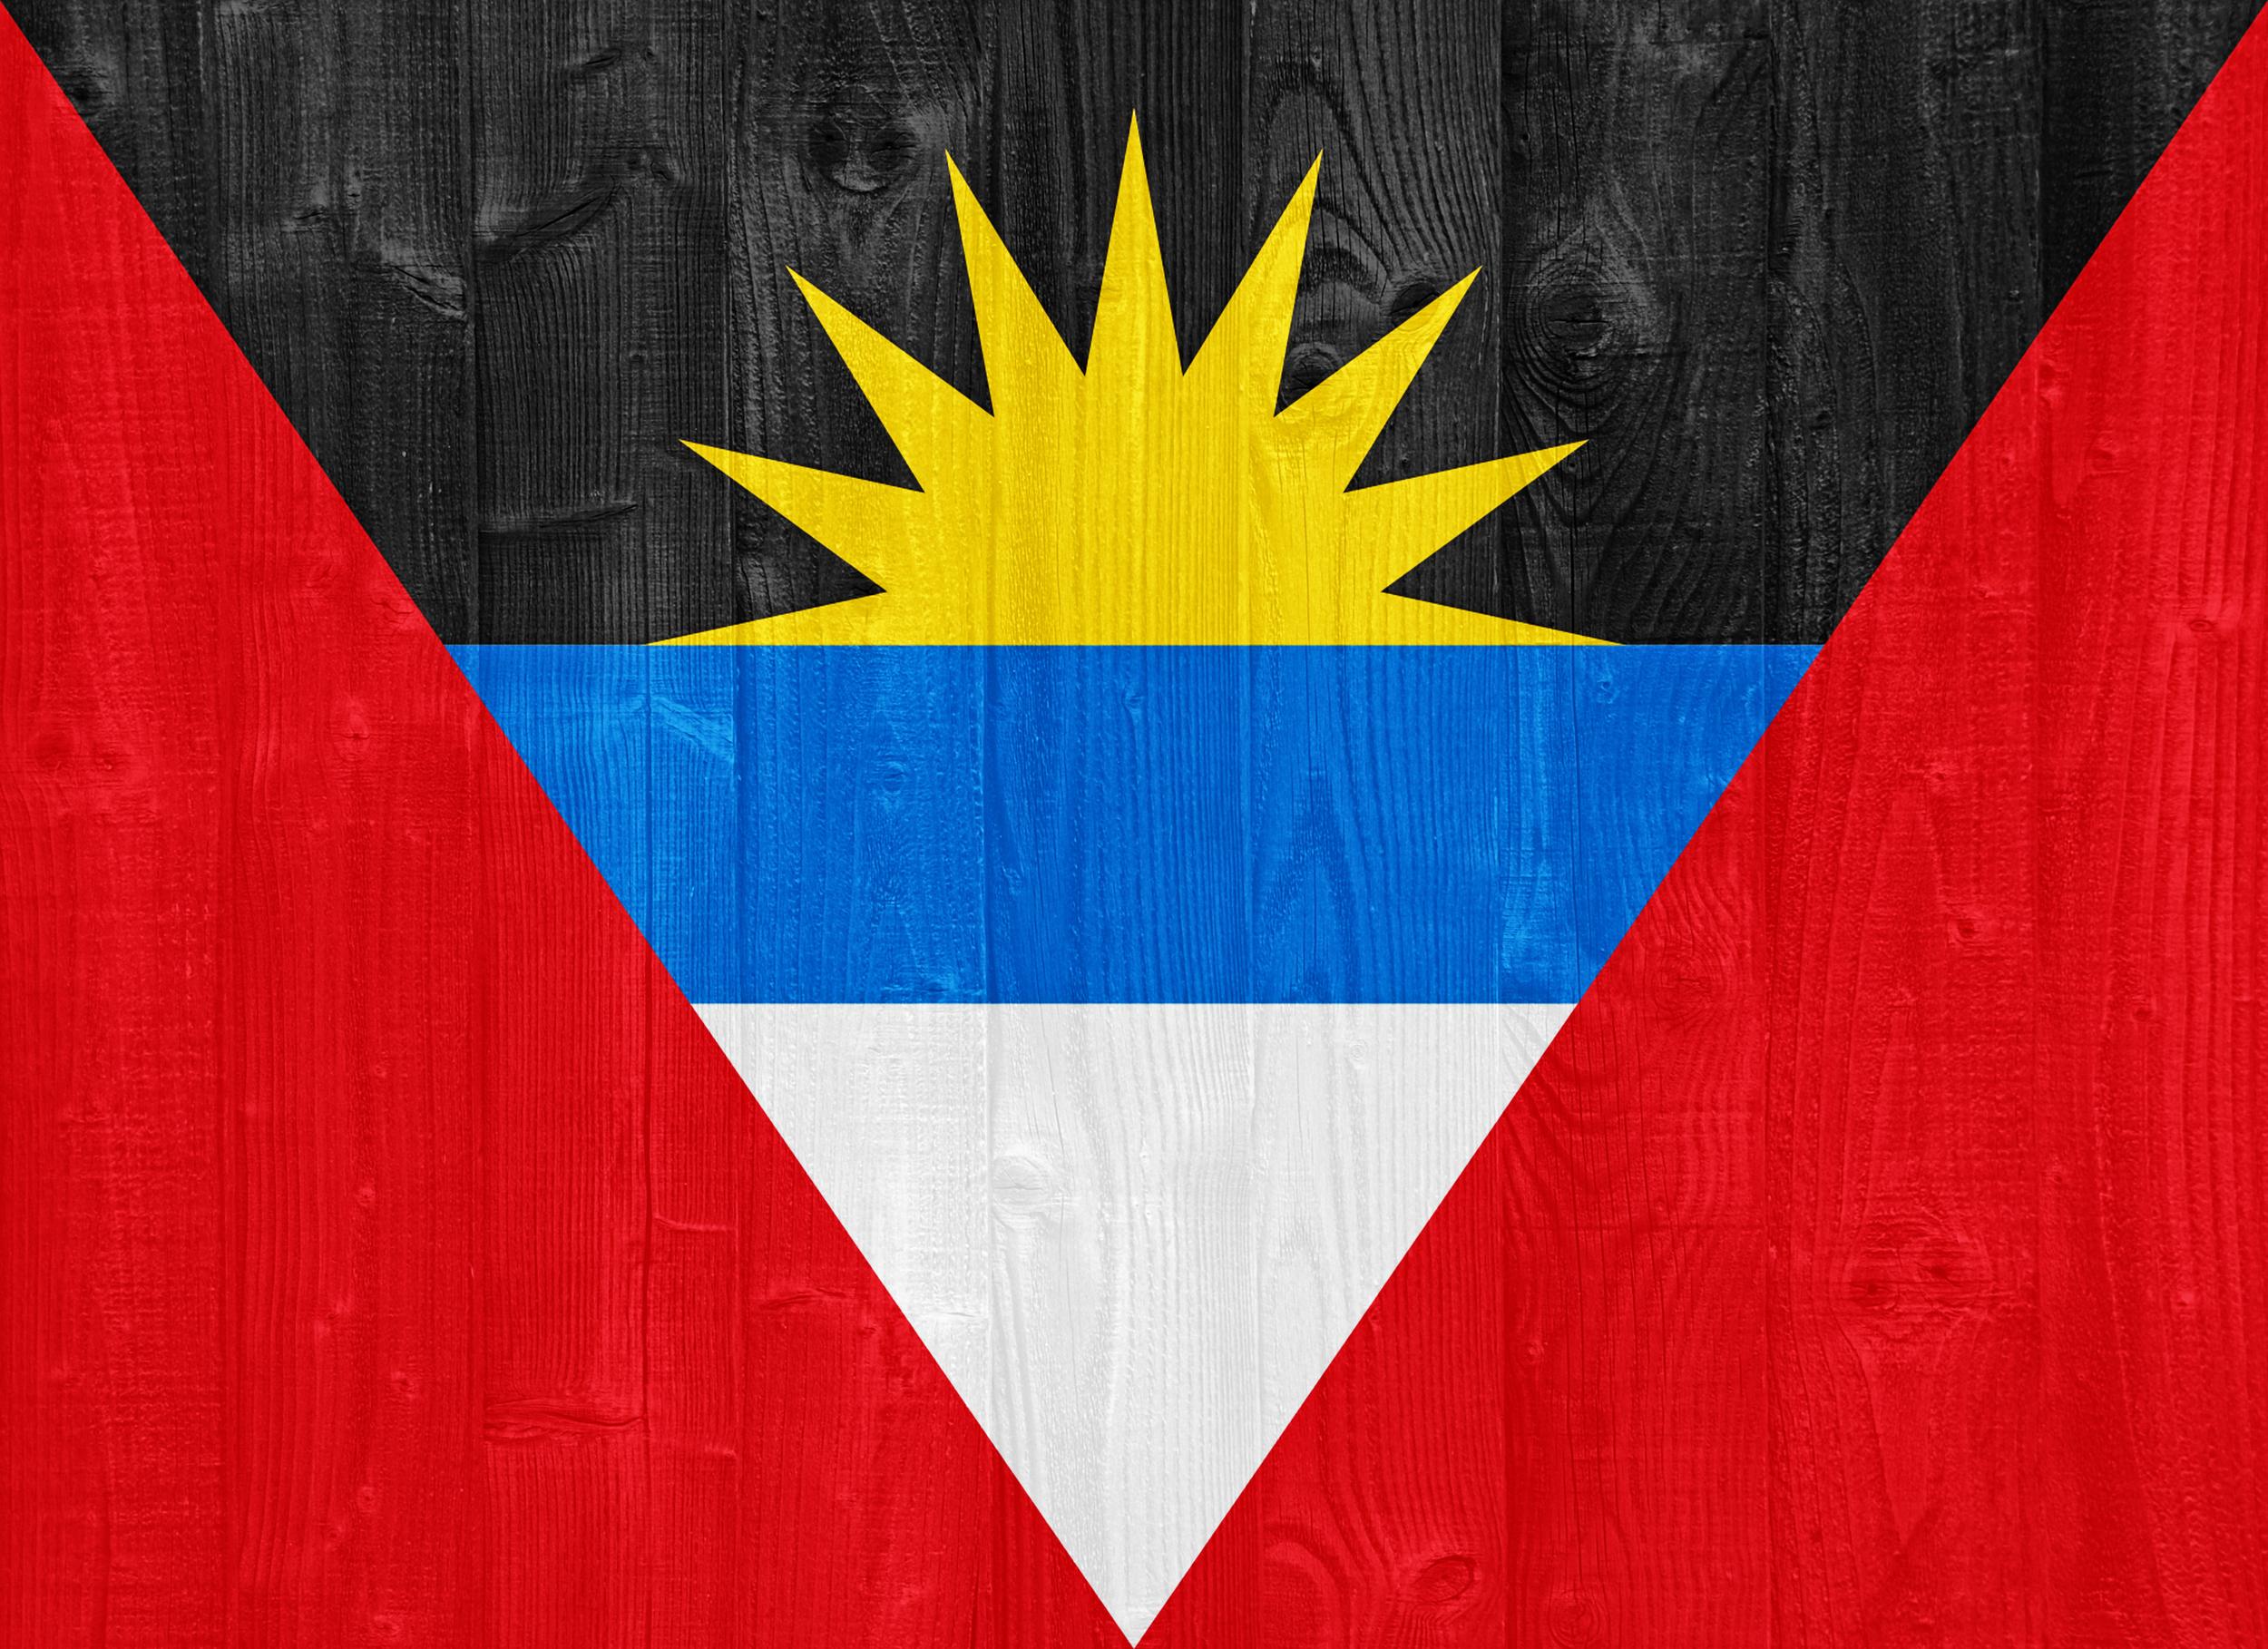 antigua-and-barbuda-flag_zyix1GC_.jpg